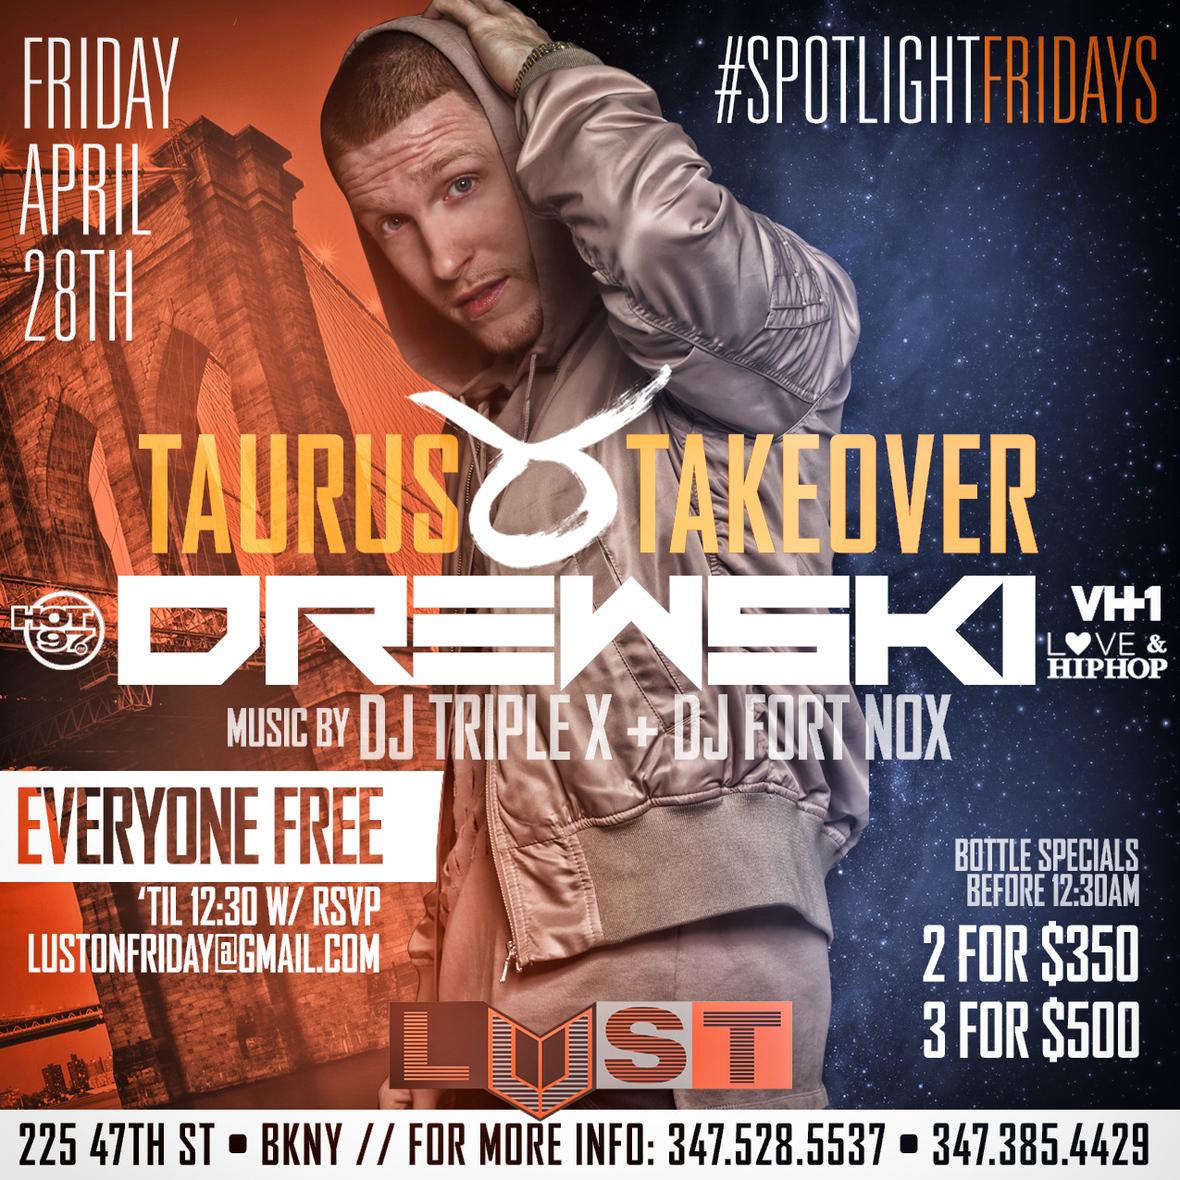 #SpotlightFridays @ Club Lust